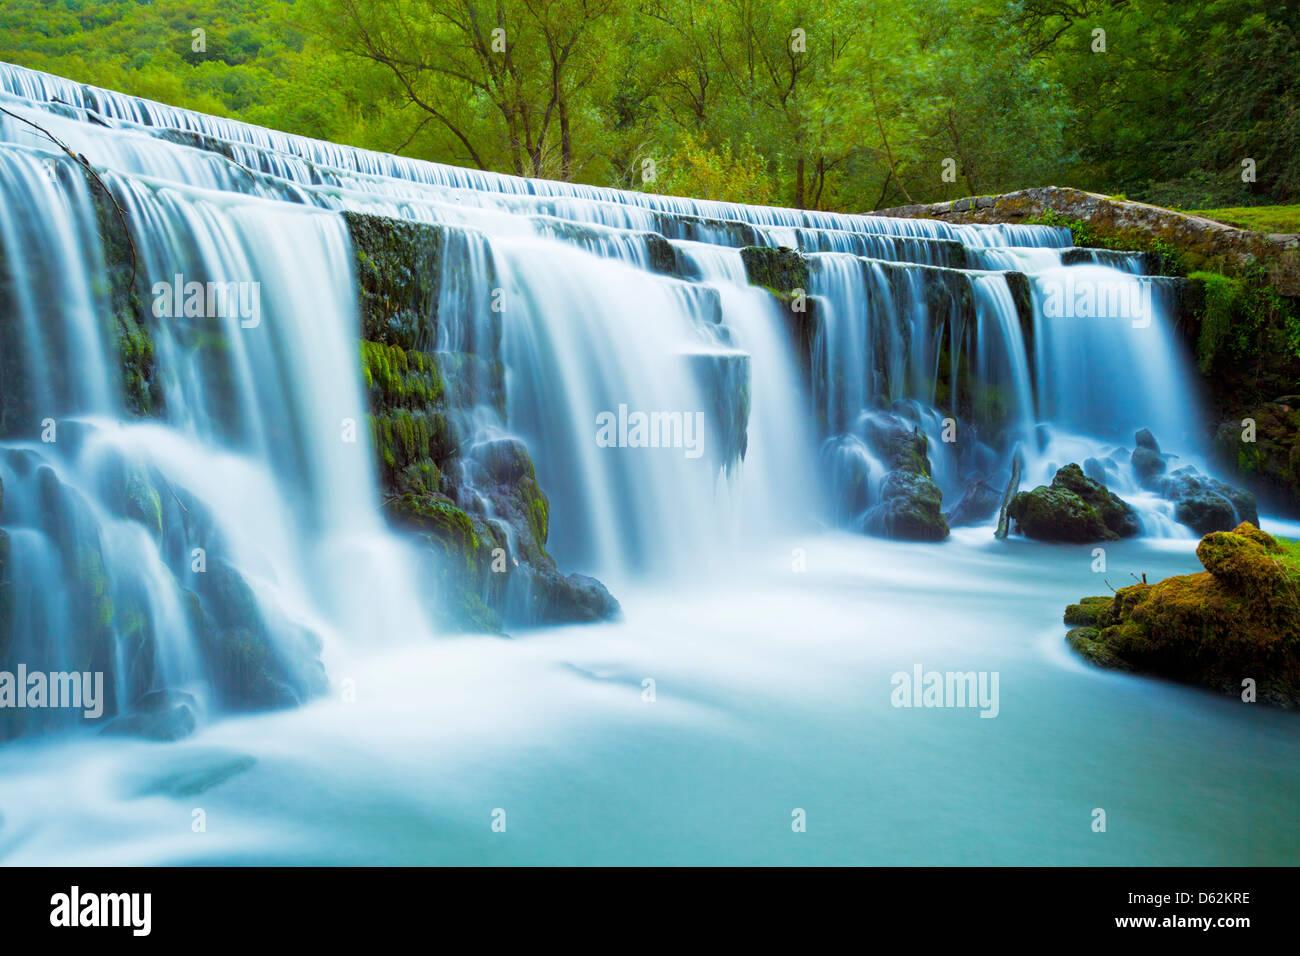 Monsal Dale Weir Wasserfall, Peak District National Park, Derbyshire, England, GB, UK, EU, Europa Stockbild